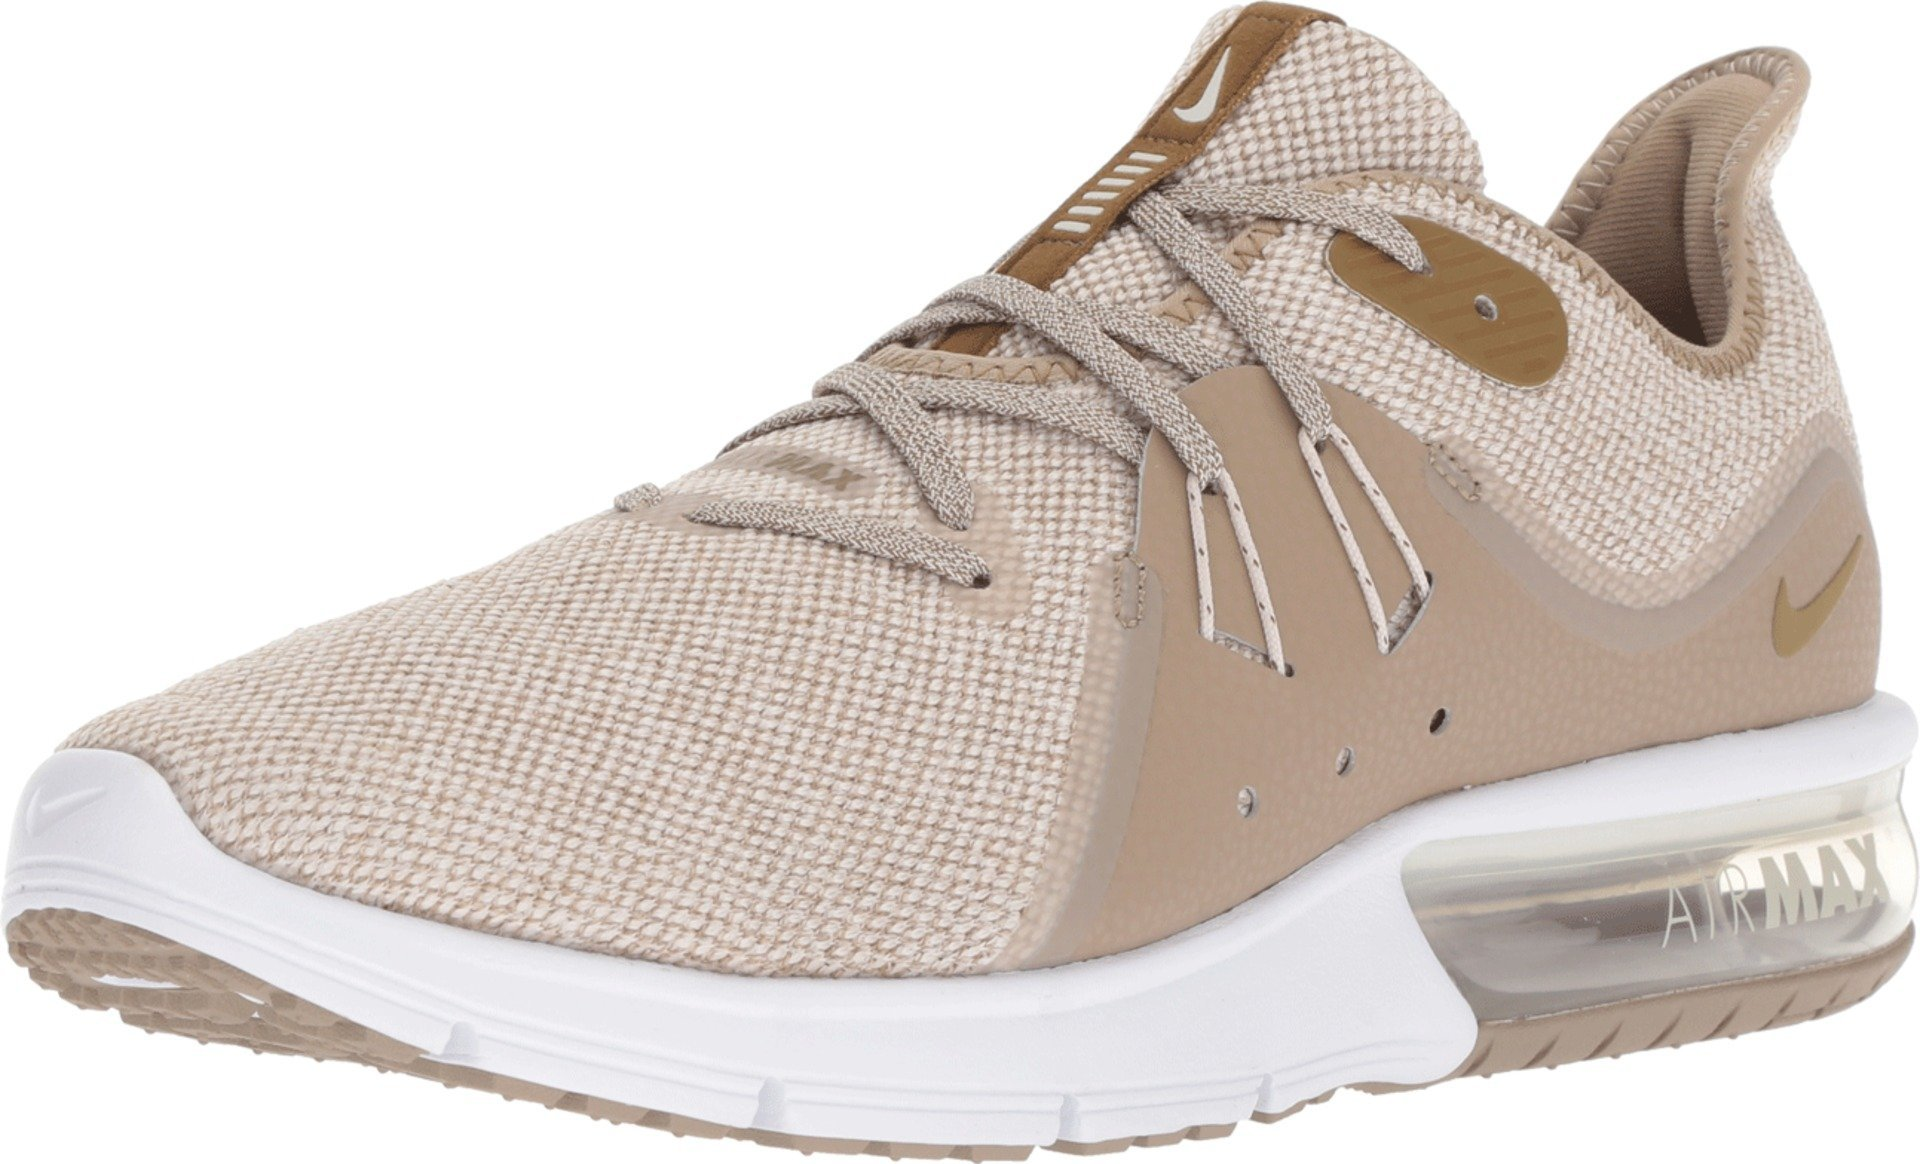 Galleon Nike Men's Air Max Sequent 3 Running Shoe Desert